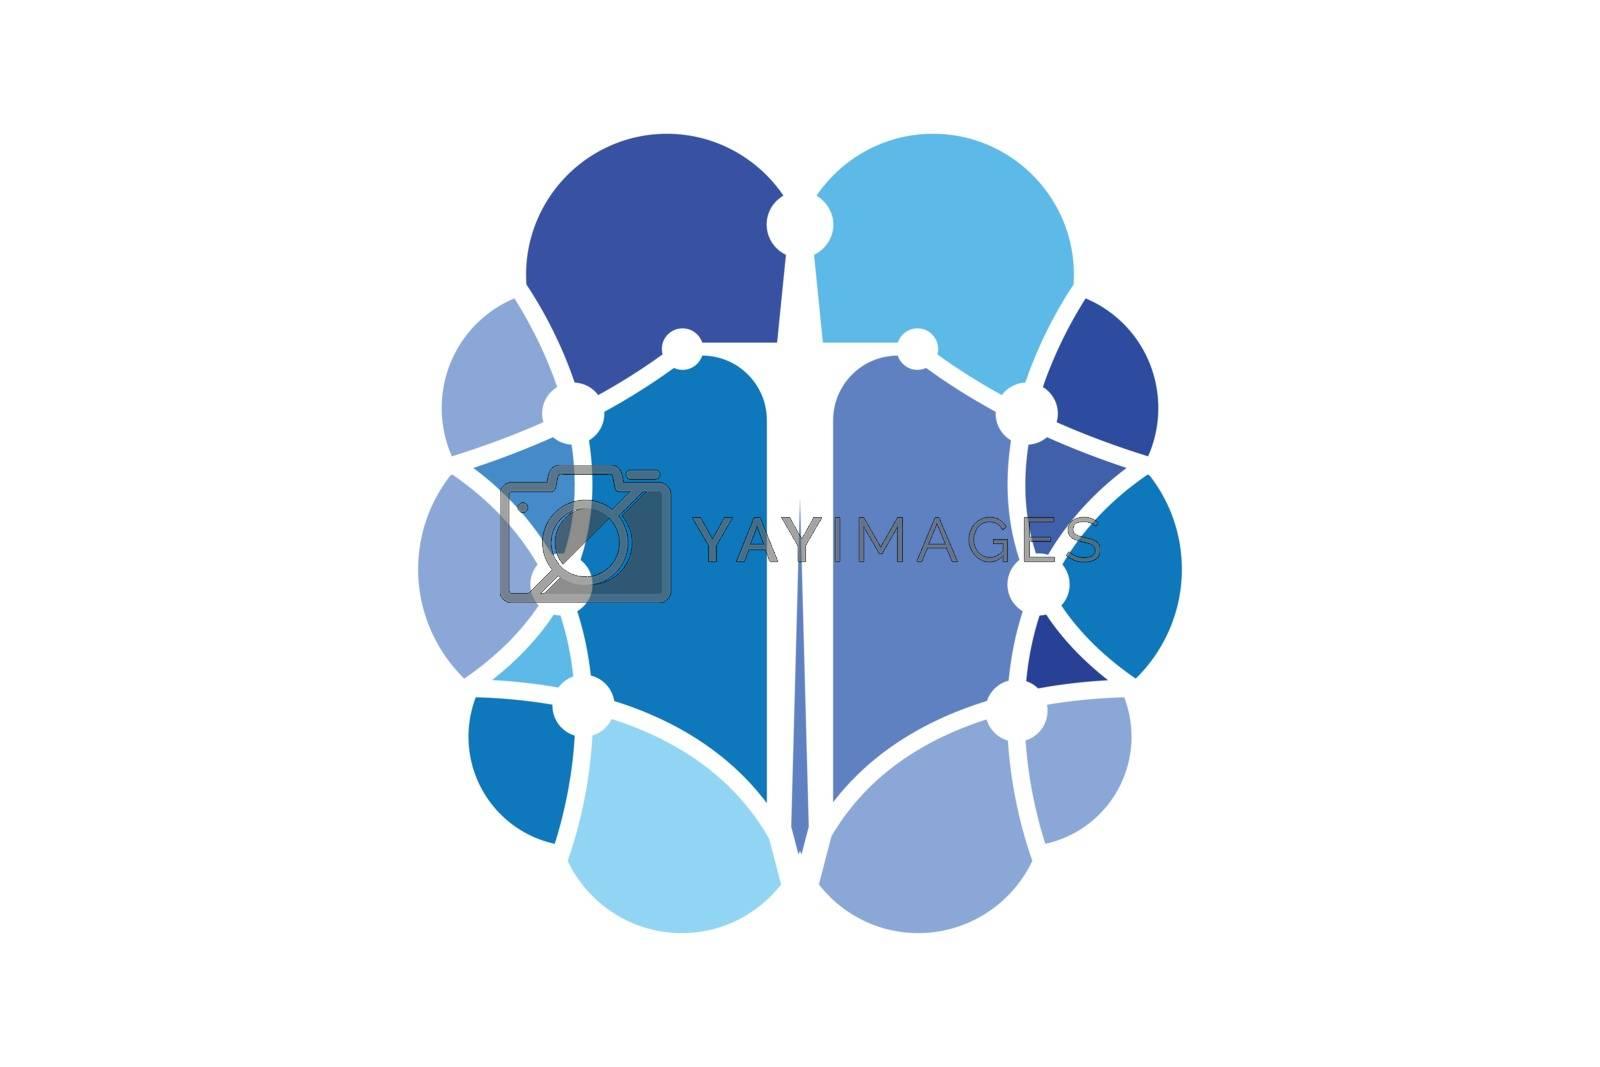 Brain connection logo design, digital brain logo template, Brain logo